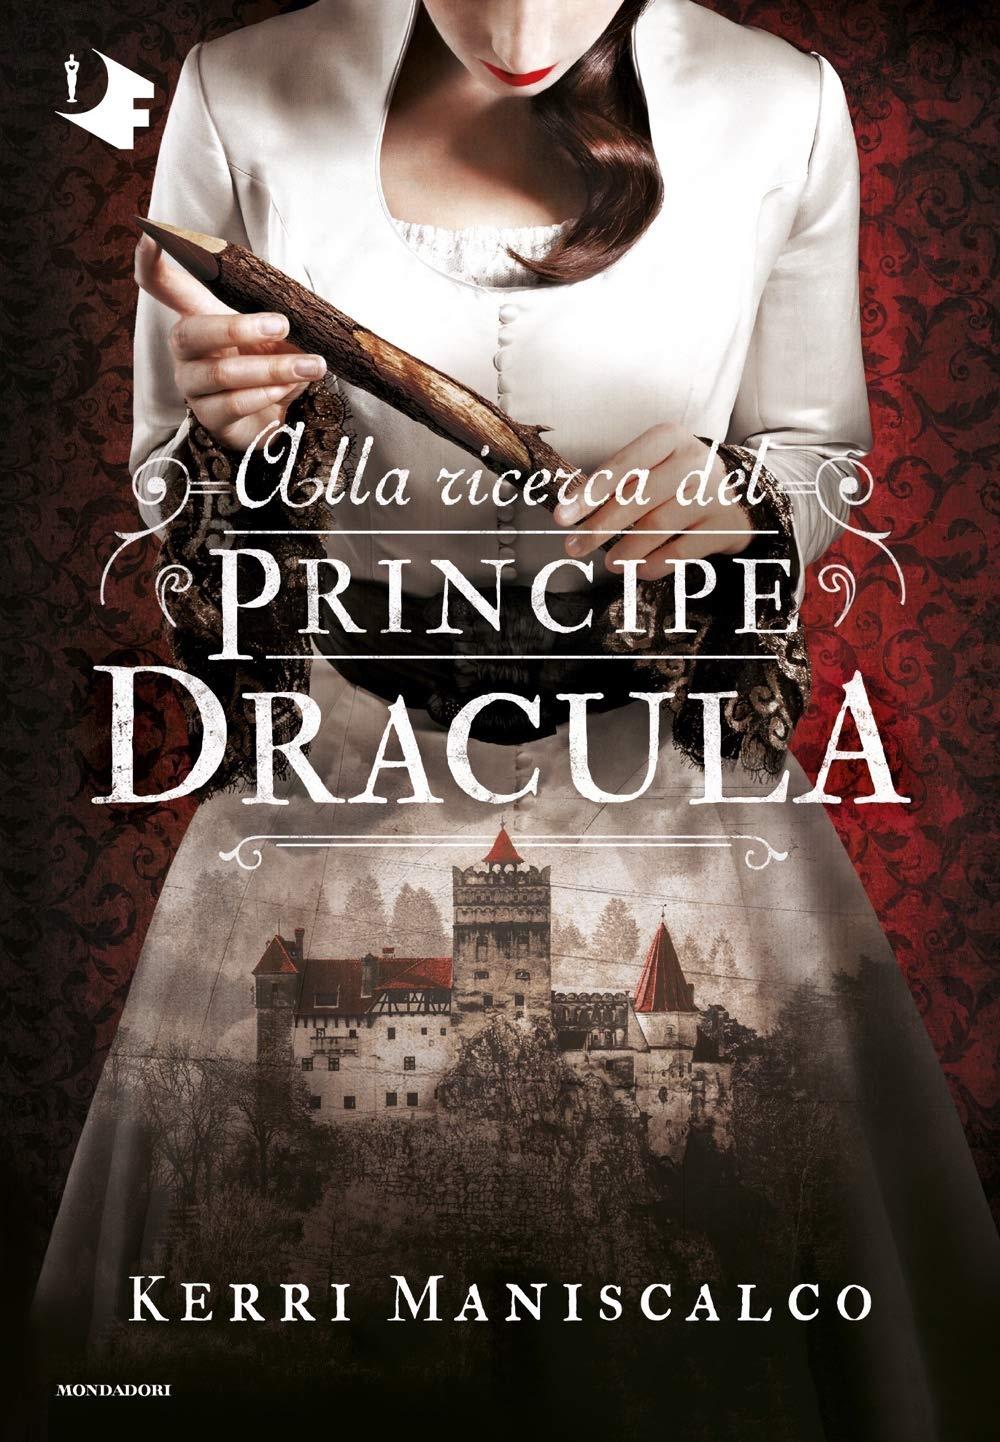 Dracula libri